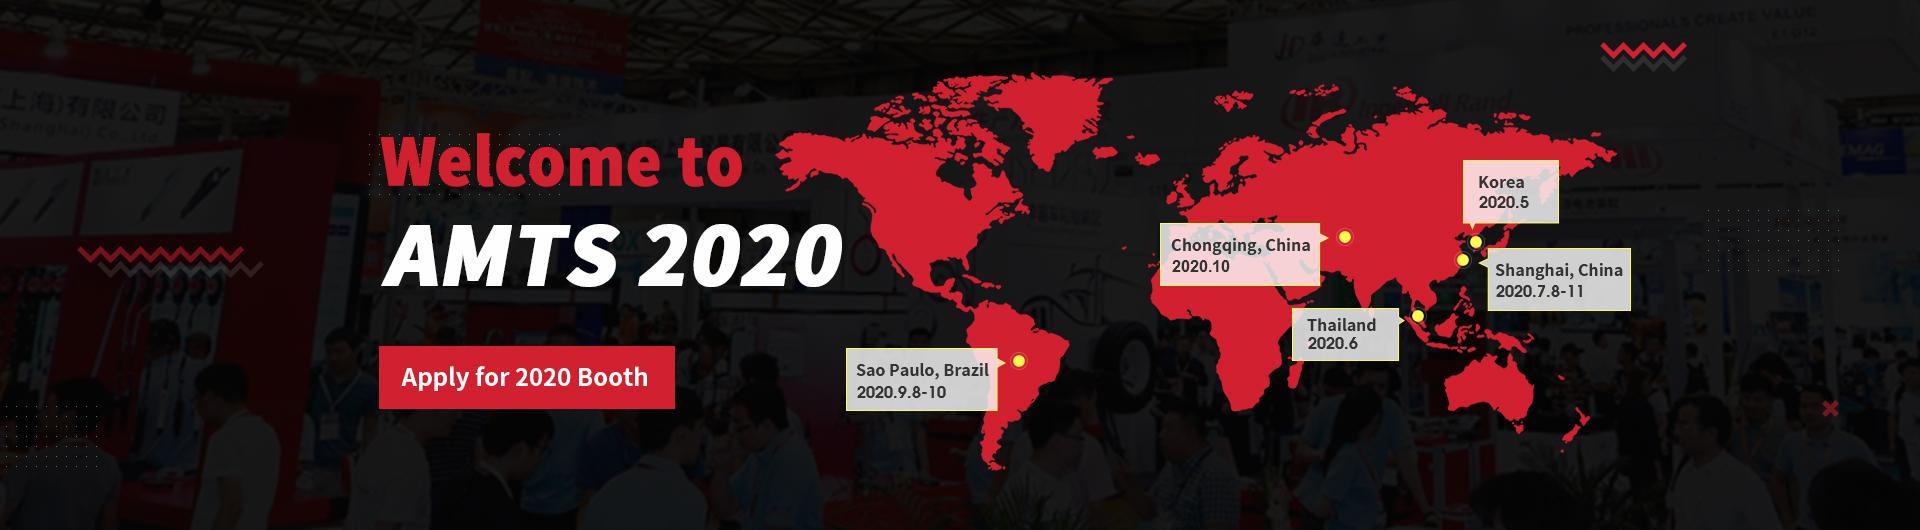 AMTS 2020 全球布局 en